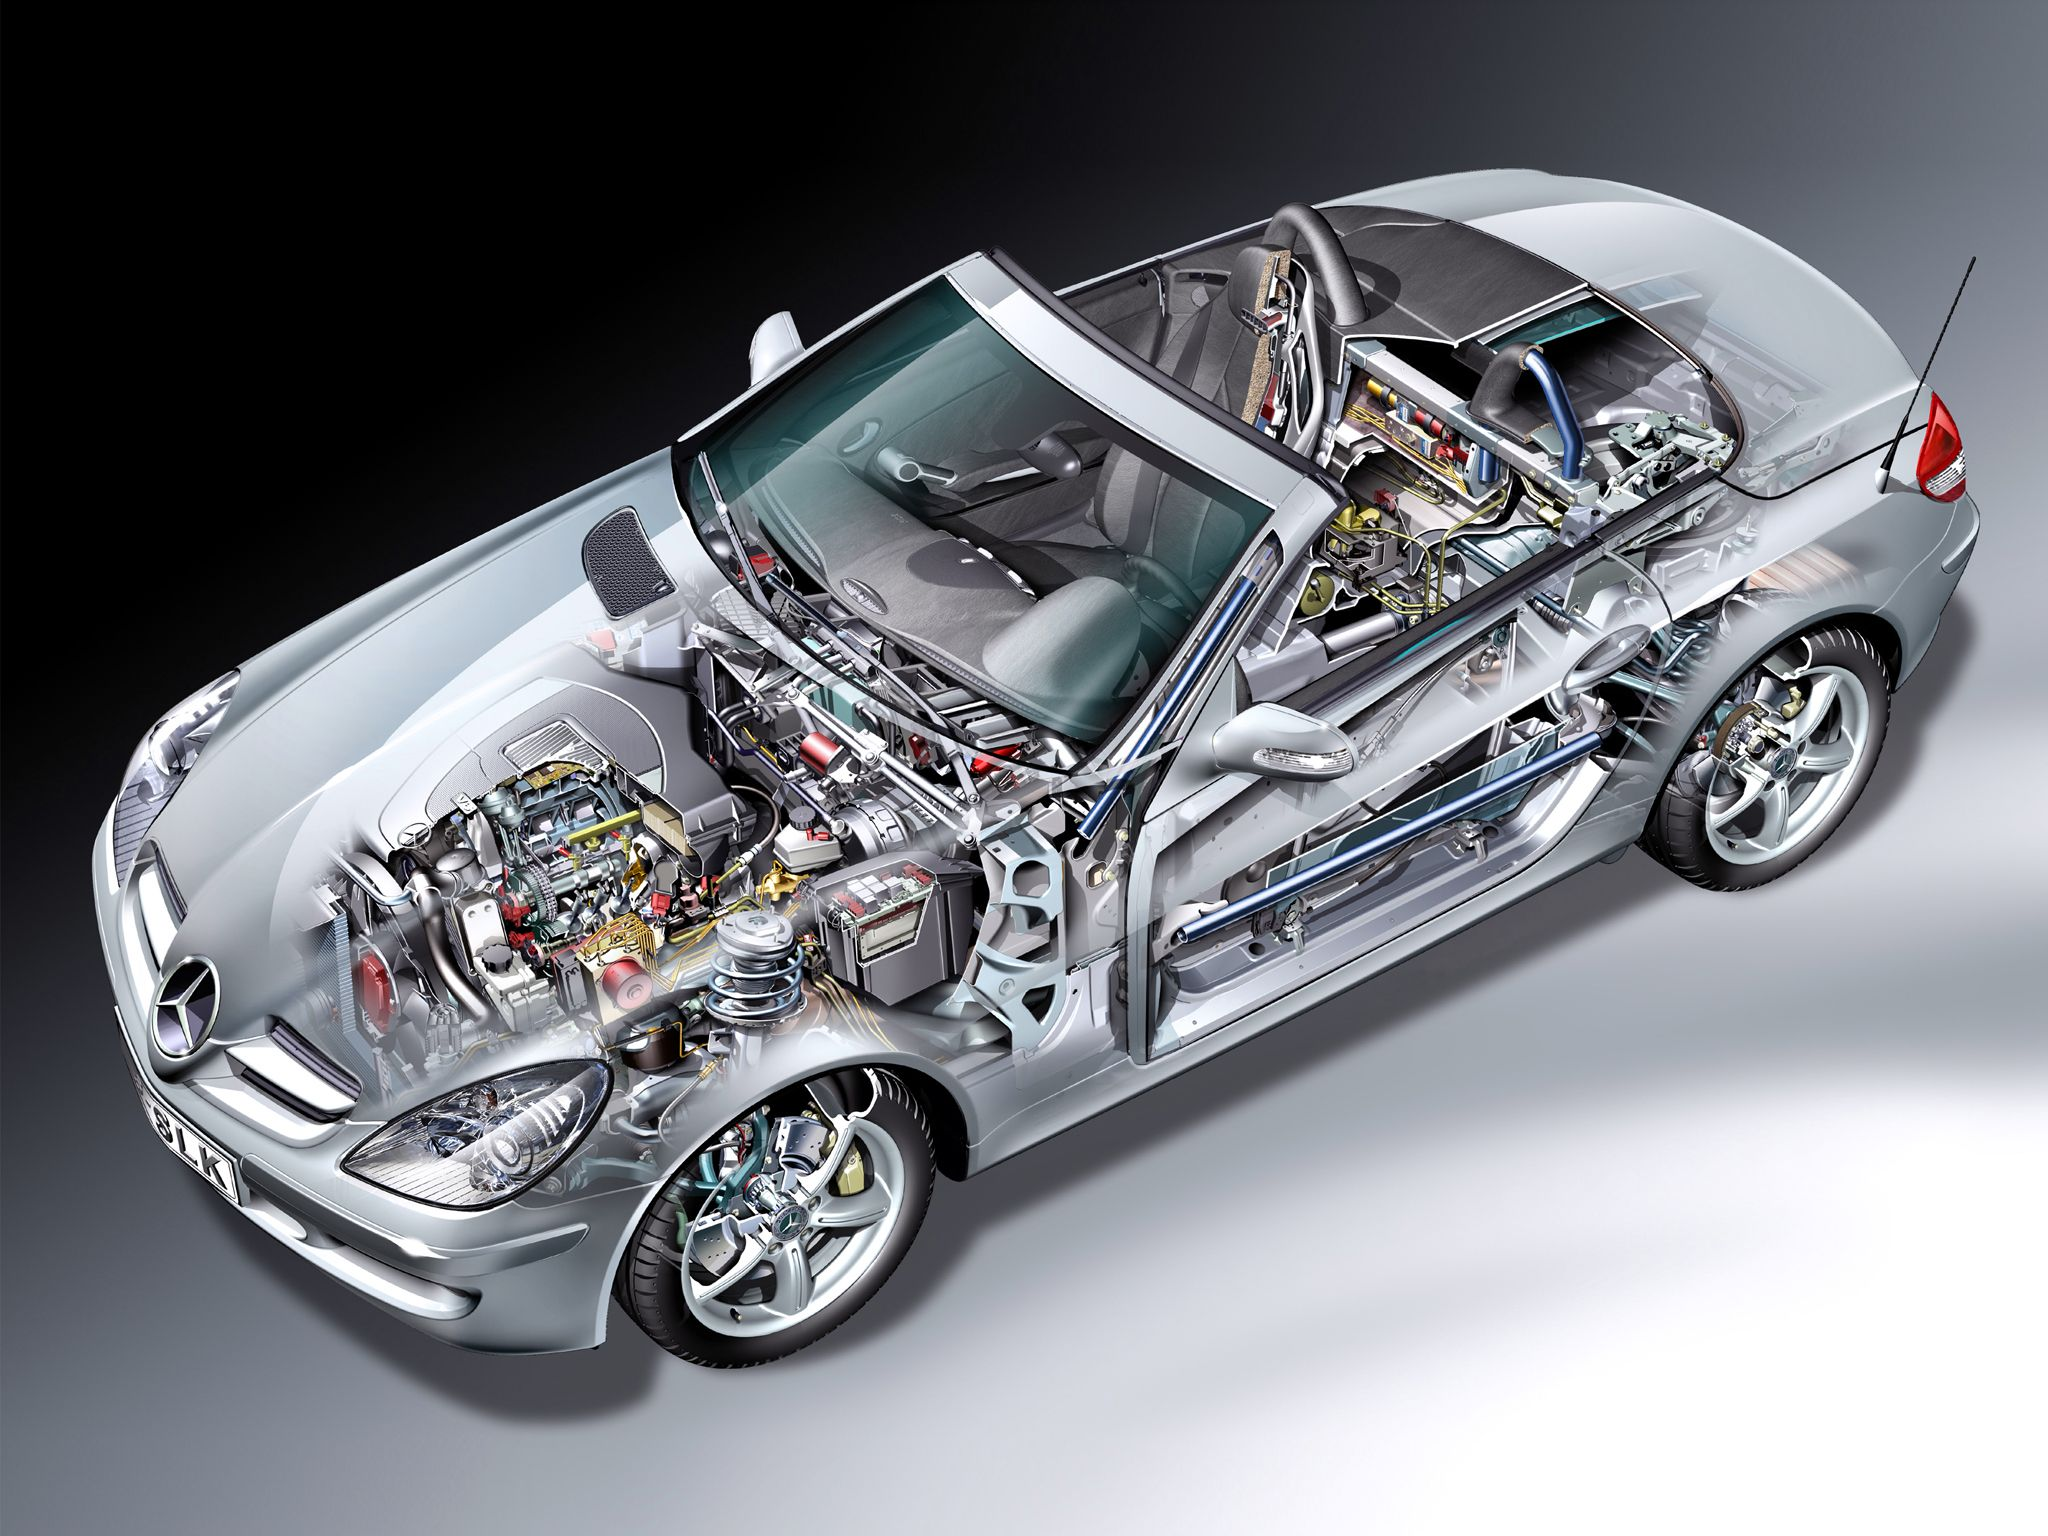 2004-2008 Mercedes-Benz SLK 55 AMG (R171) - Illustration unattributed